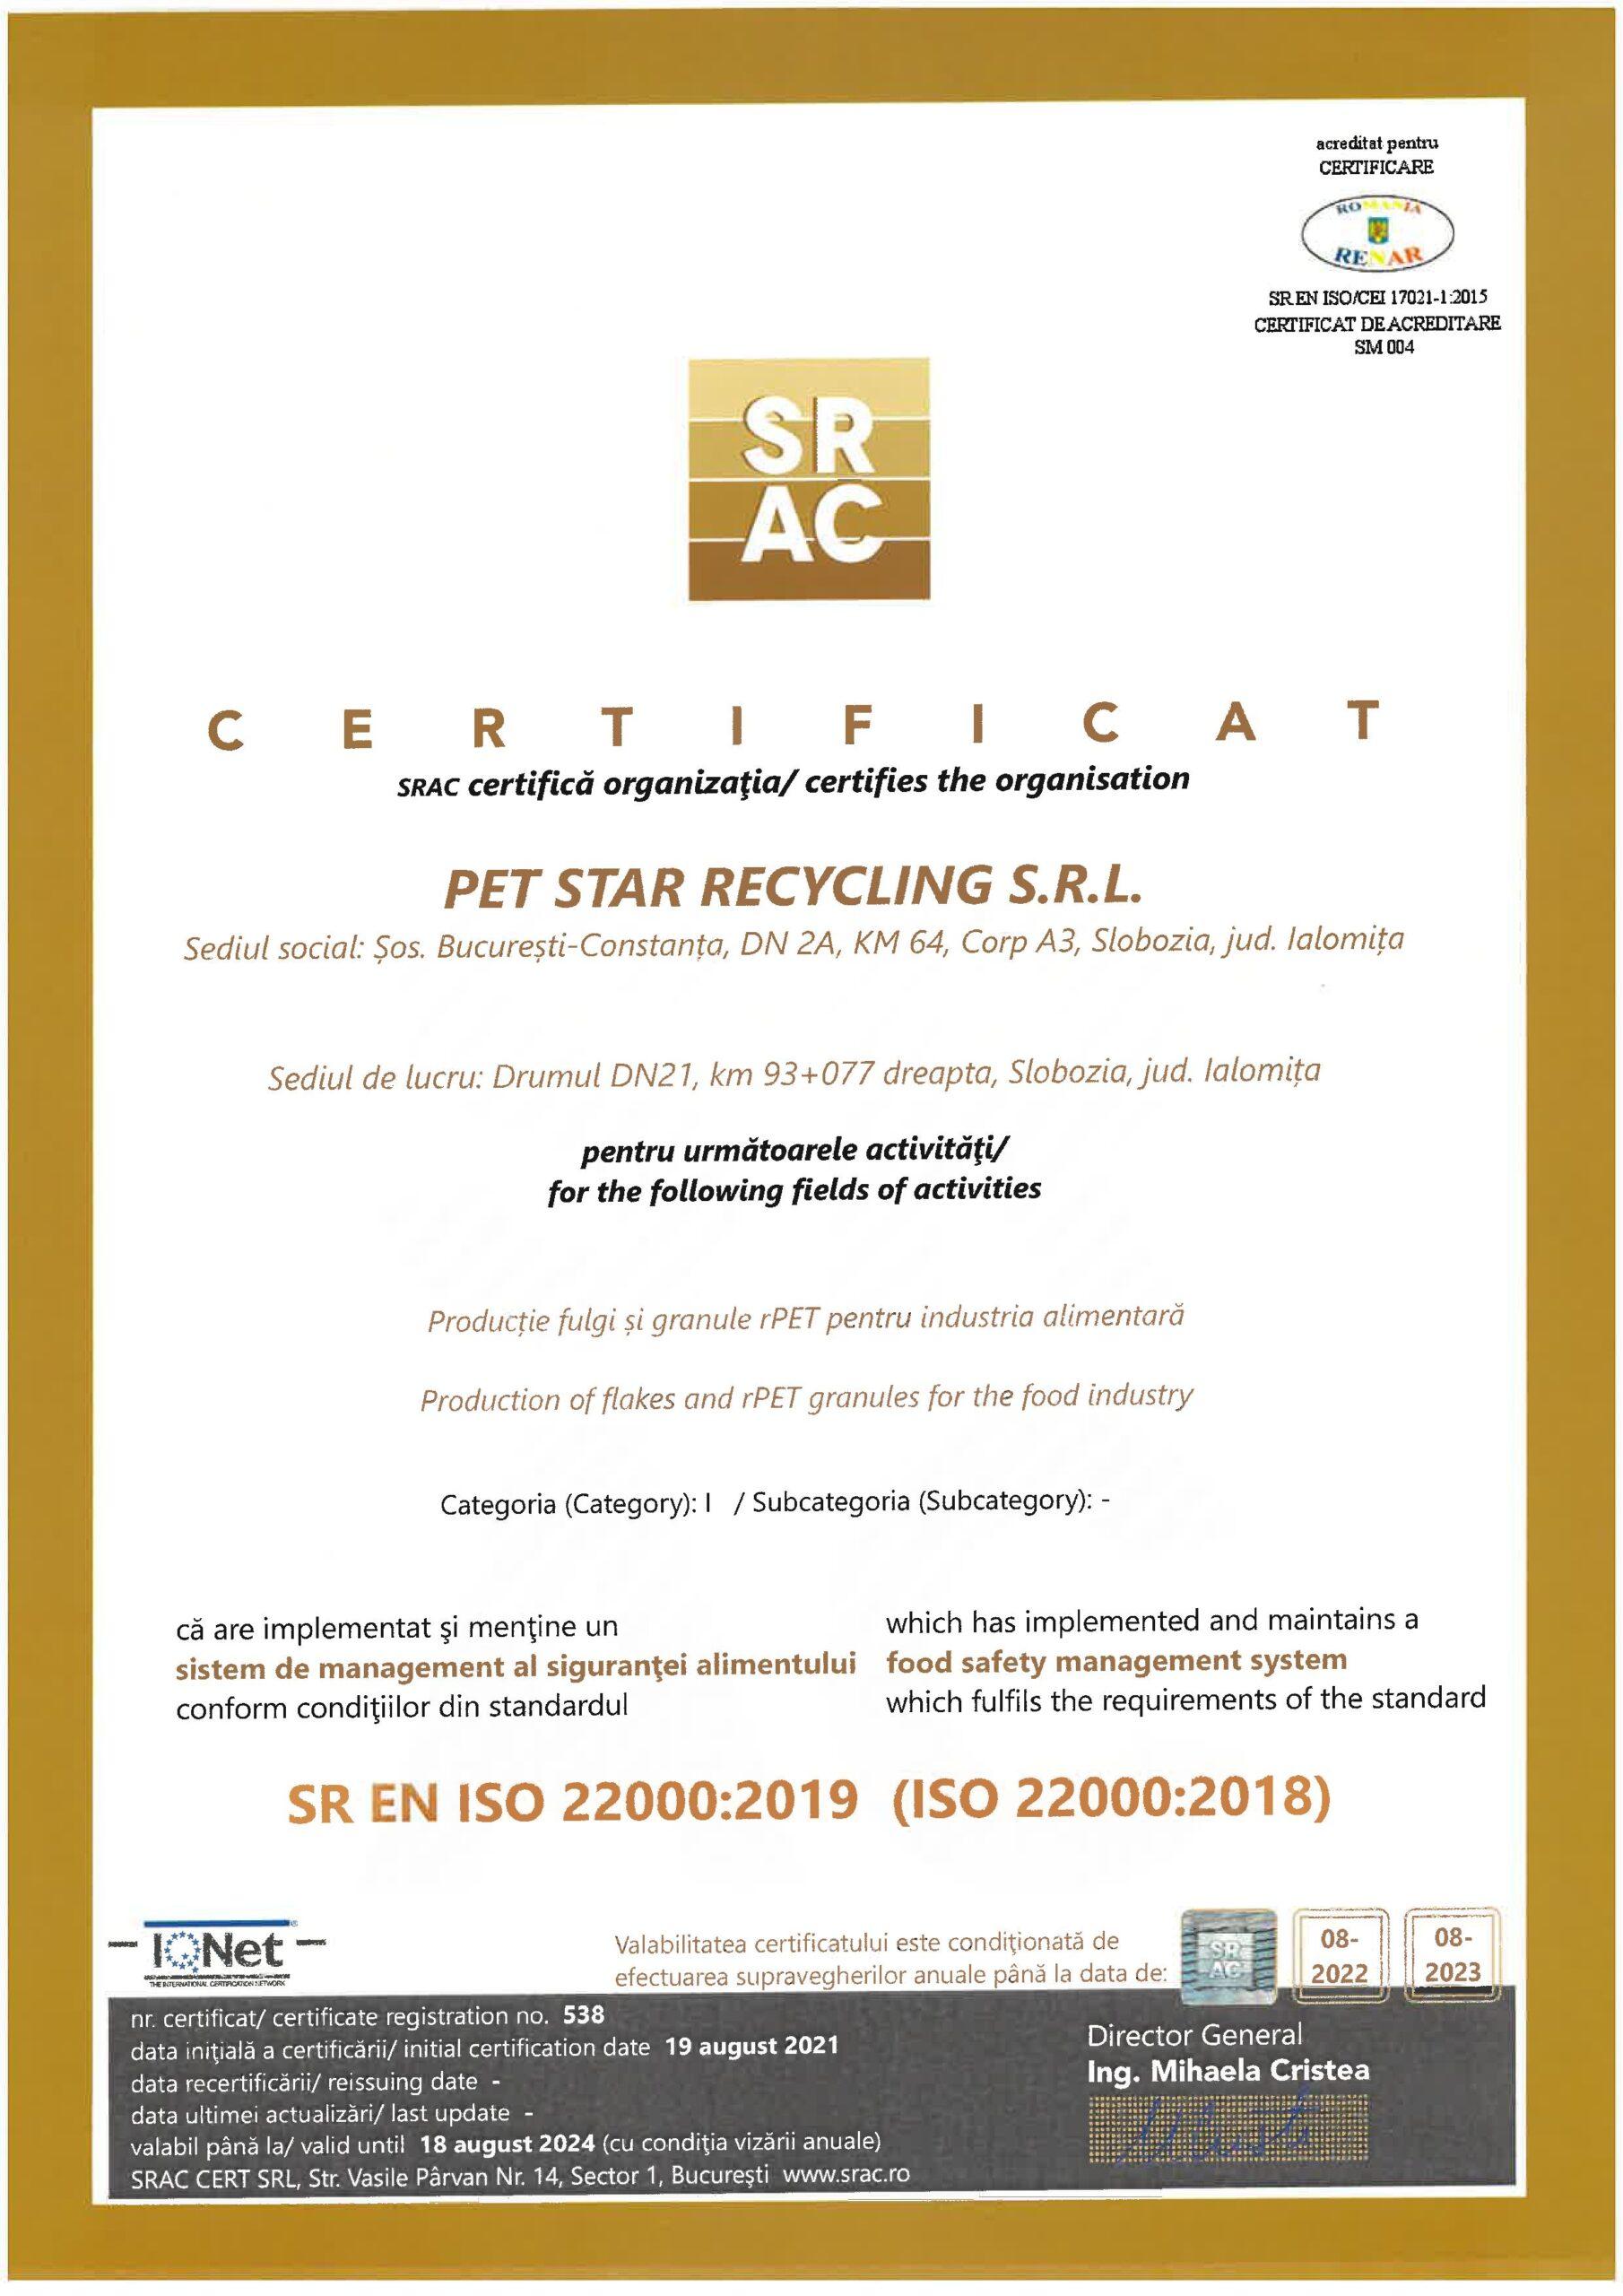 Certificare SRAC ISO 22000:2019